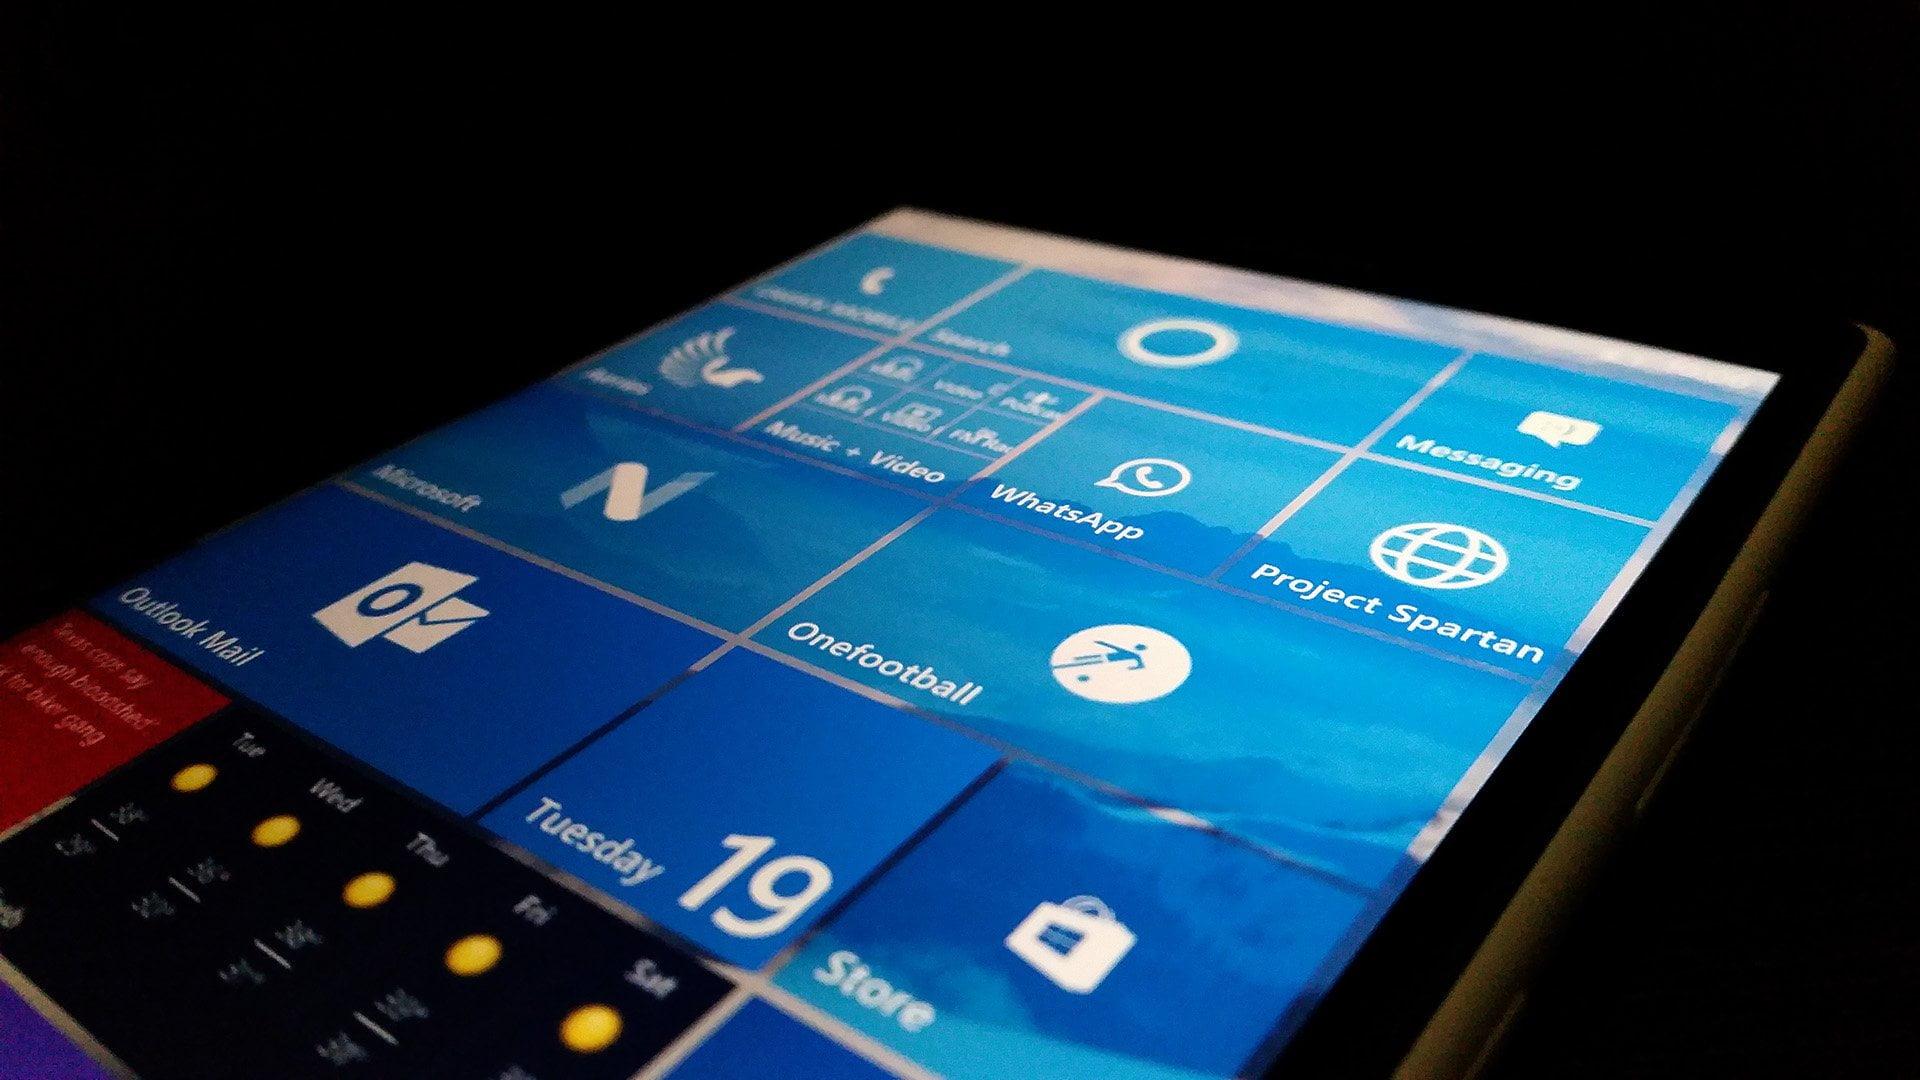 Sistema operativo en Lumia 1520